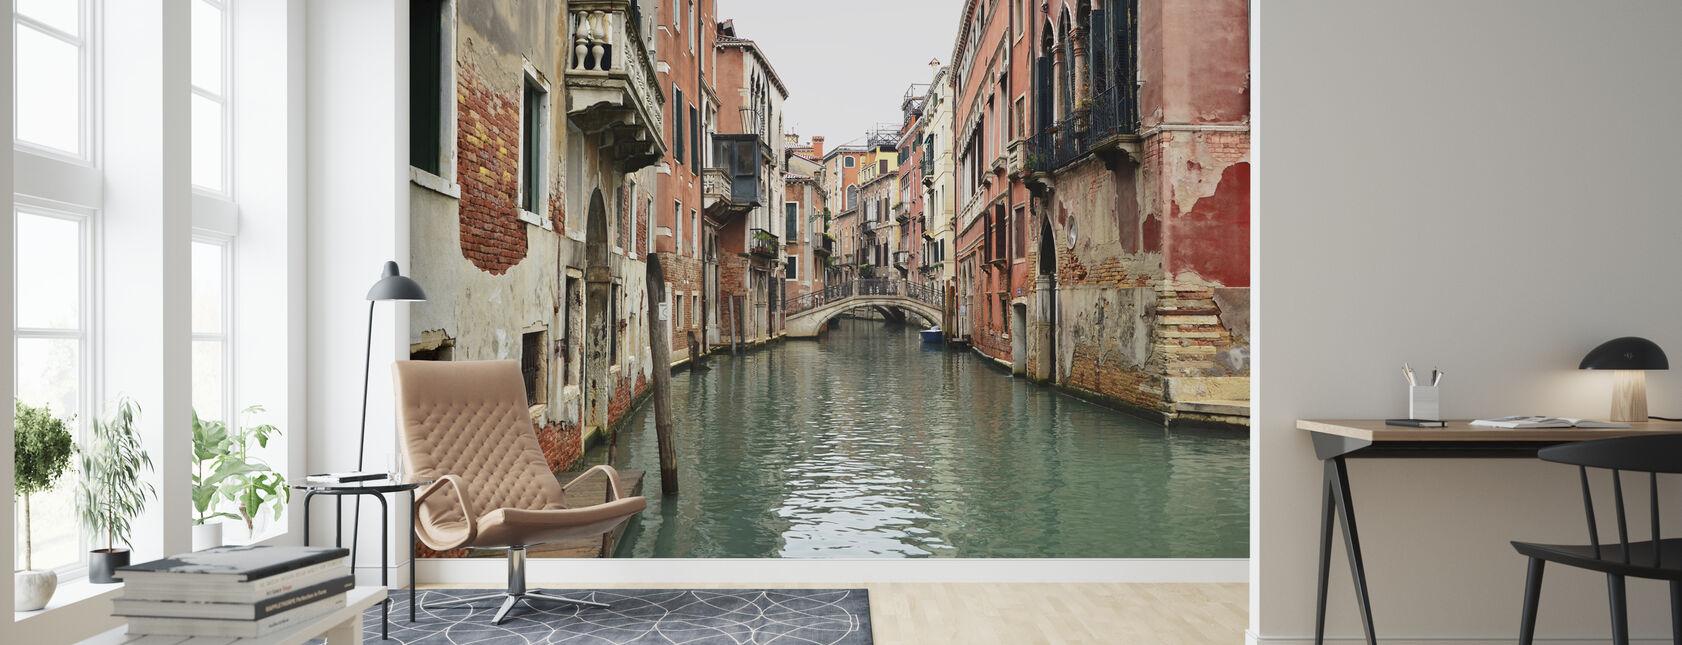 Mursten og vandgyder i Venedig - Tapet - Stue